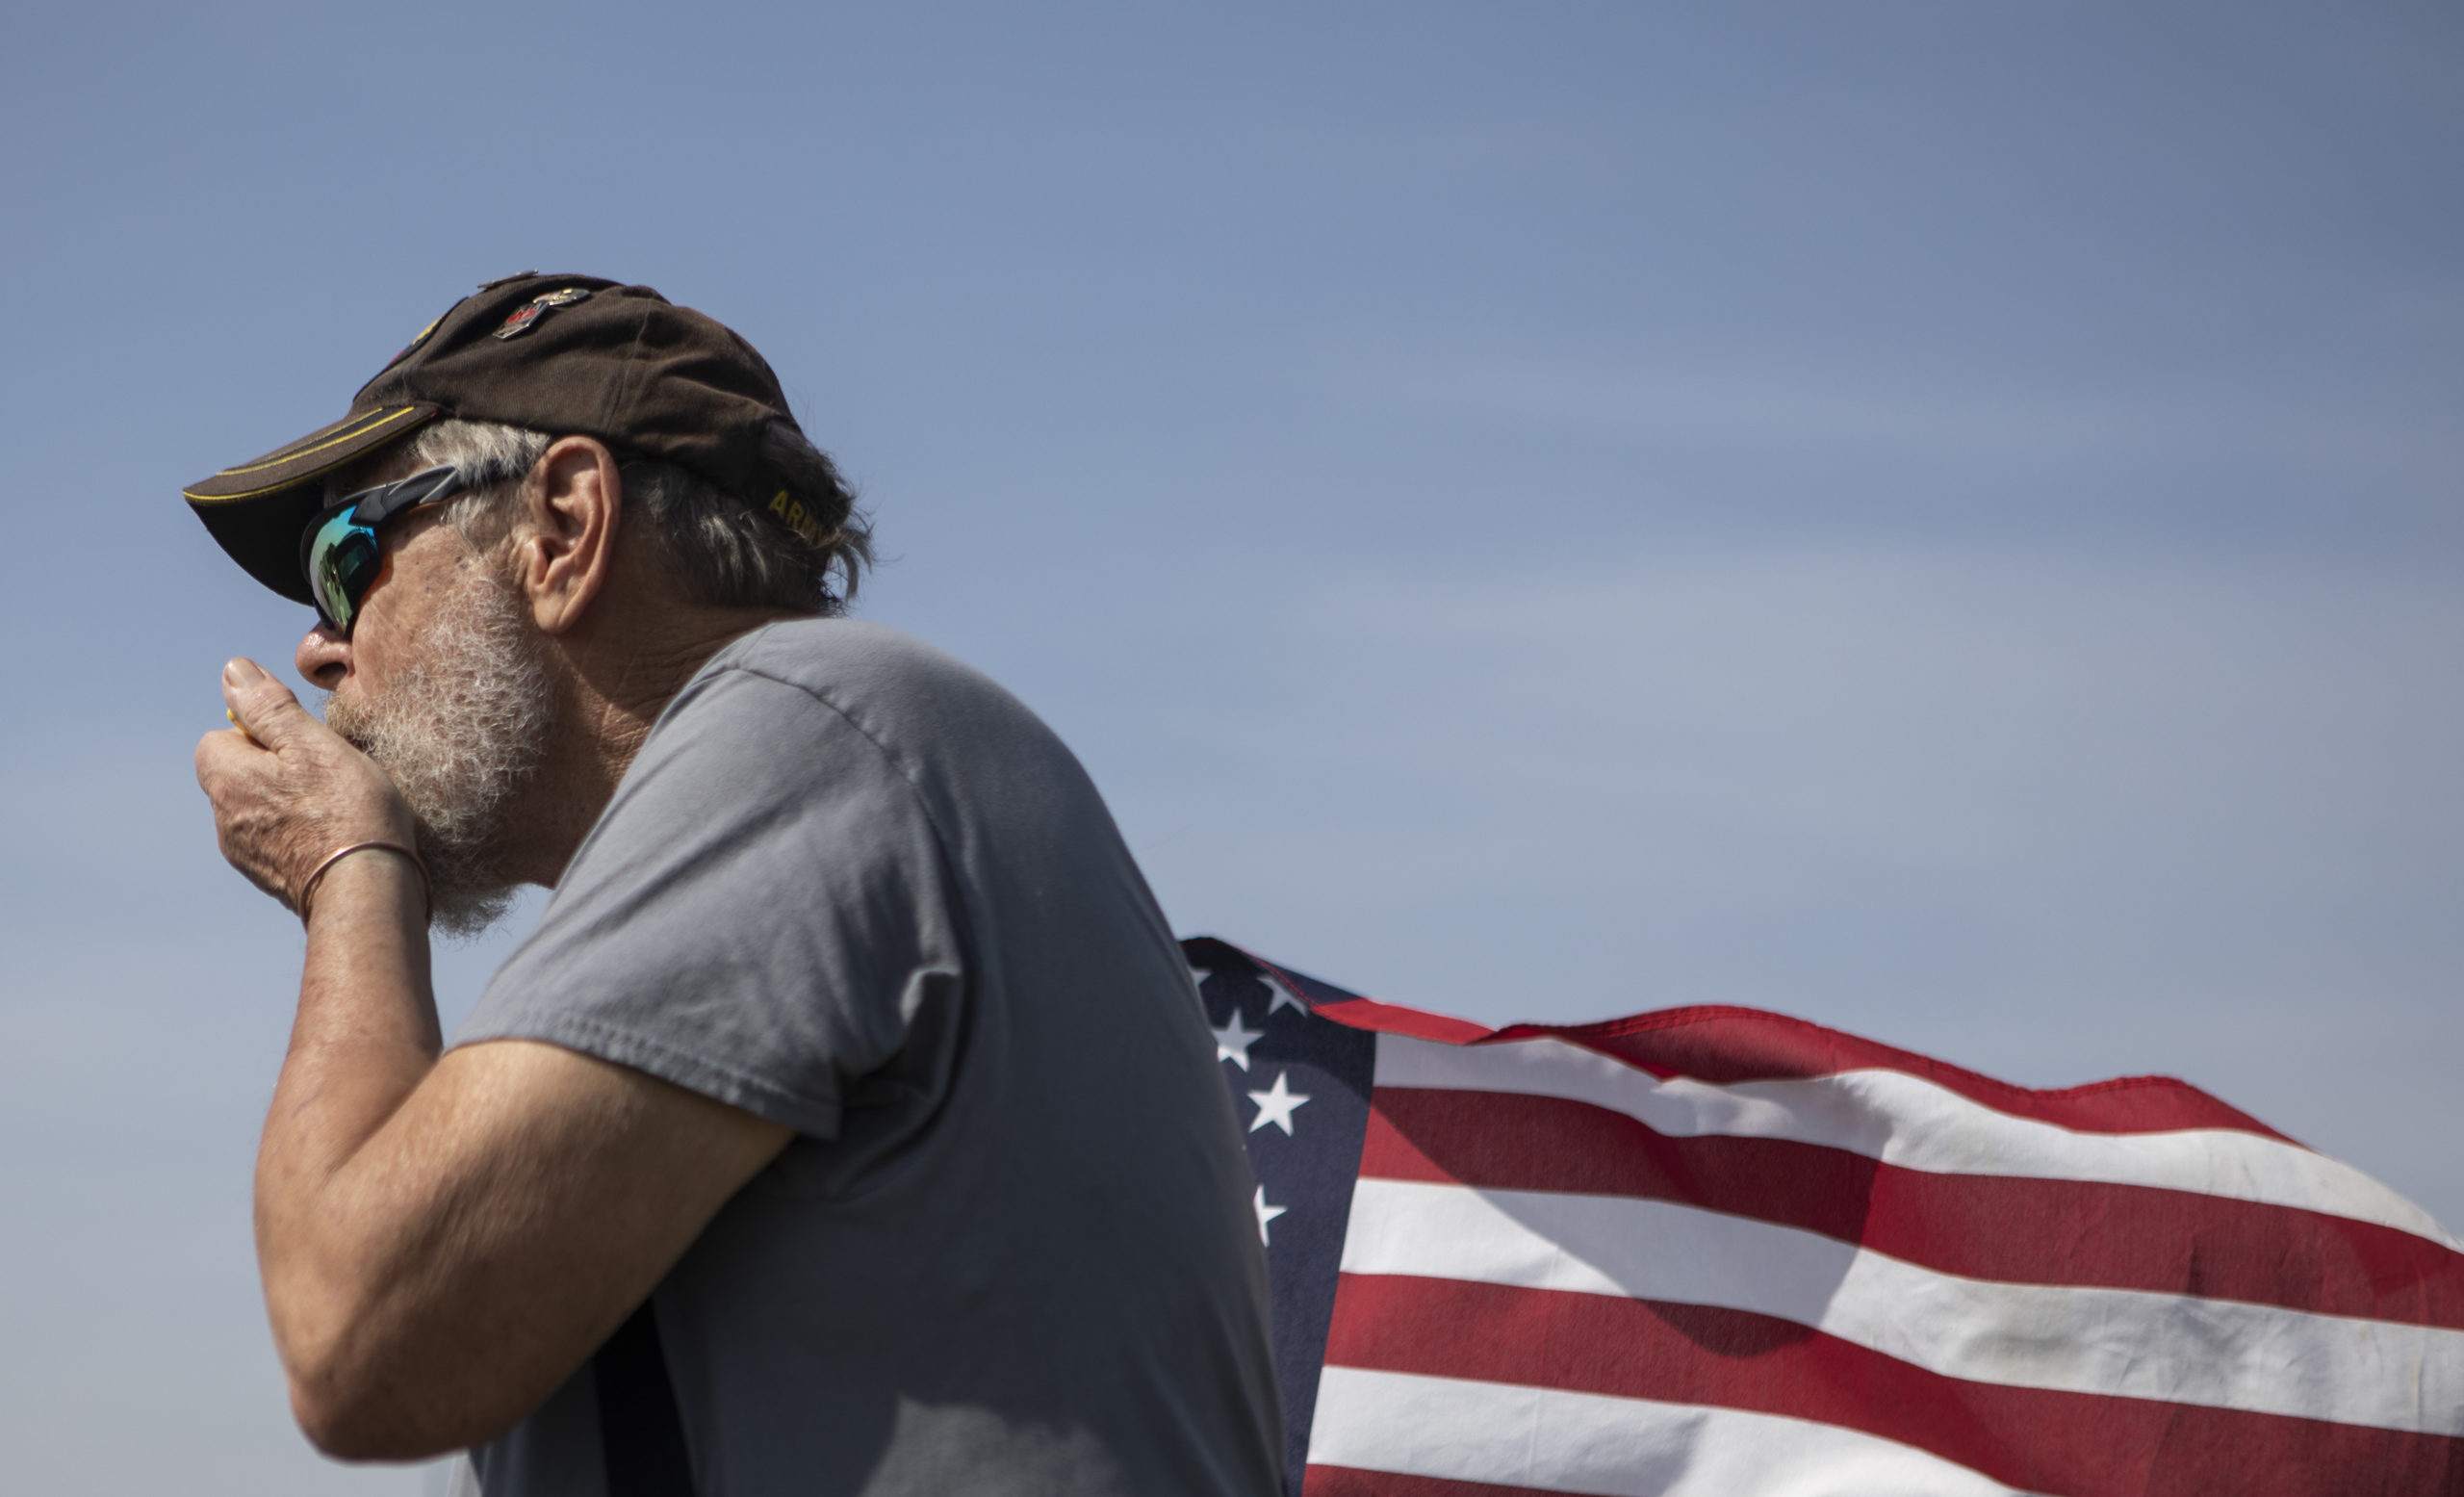 SamAugheFinal 13 1 scaled - Mobile Memorial: Sleepless night creates veteran memorial